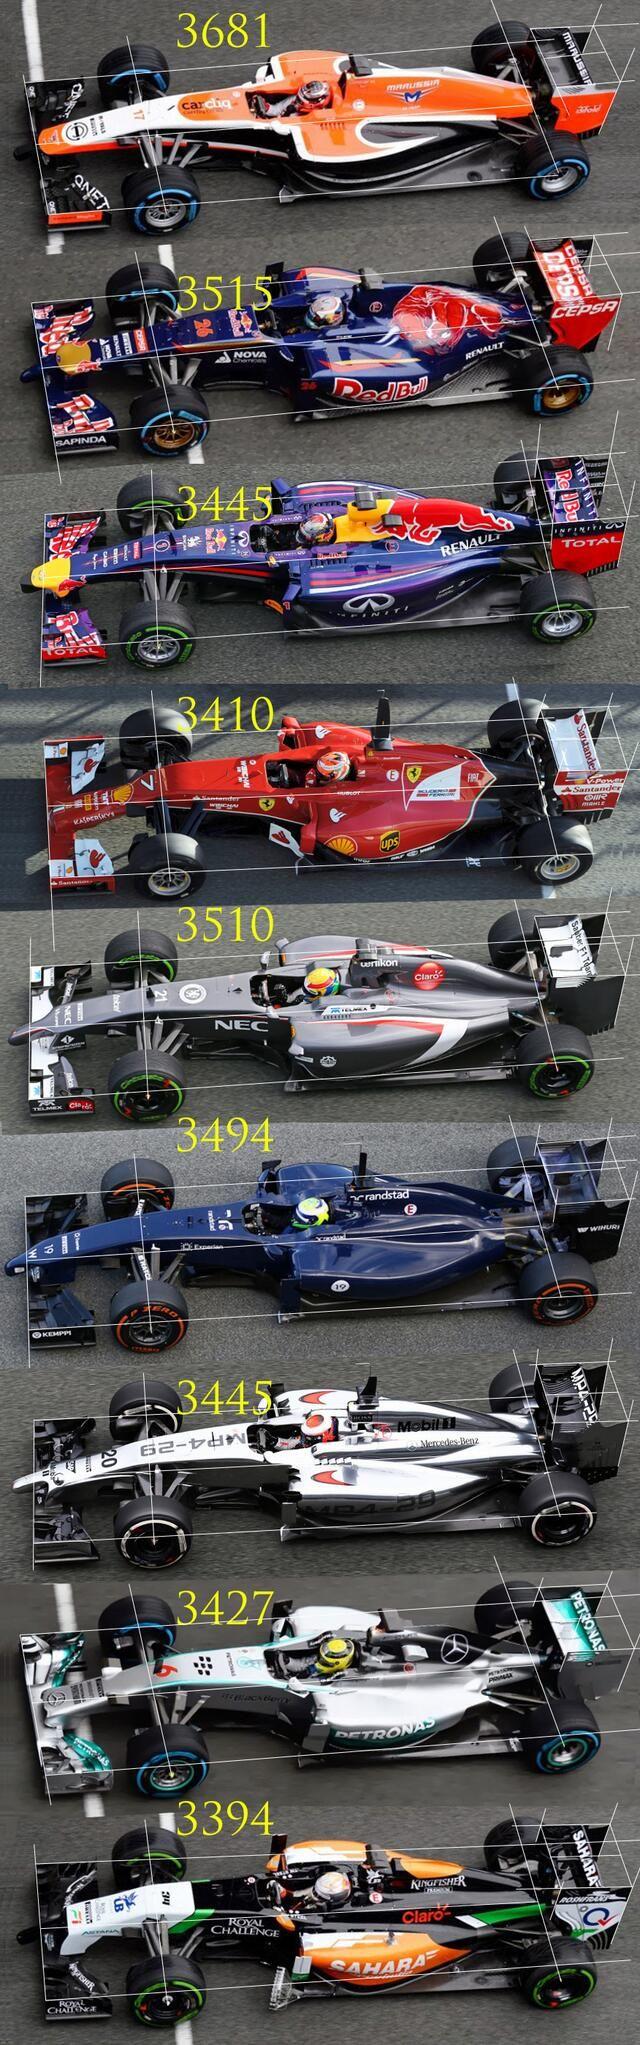 Formula 1 - 2013 (Wheel base Comparison)